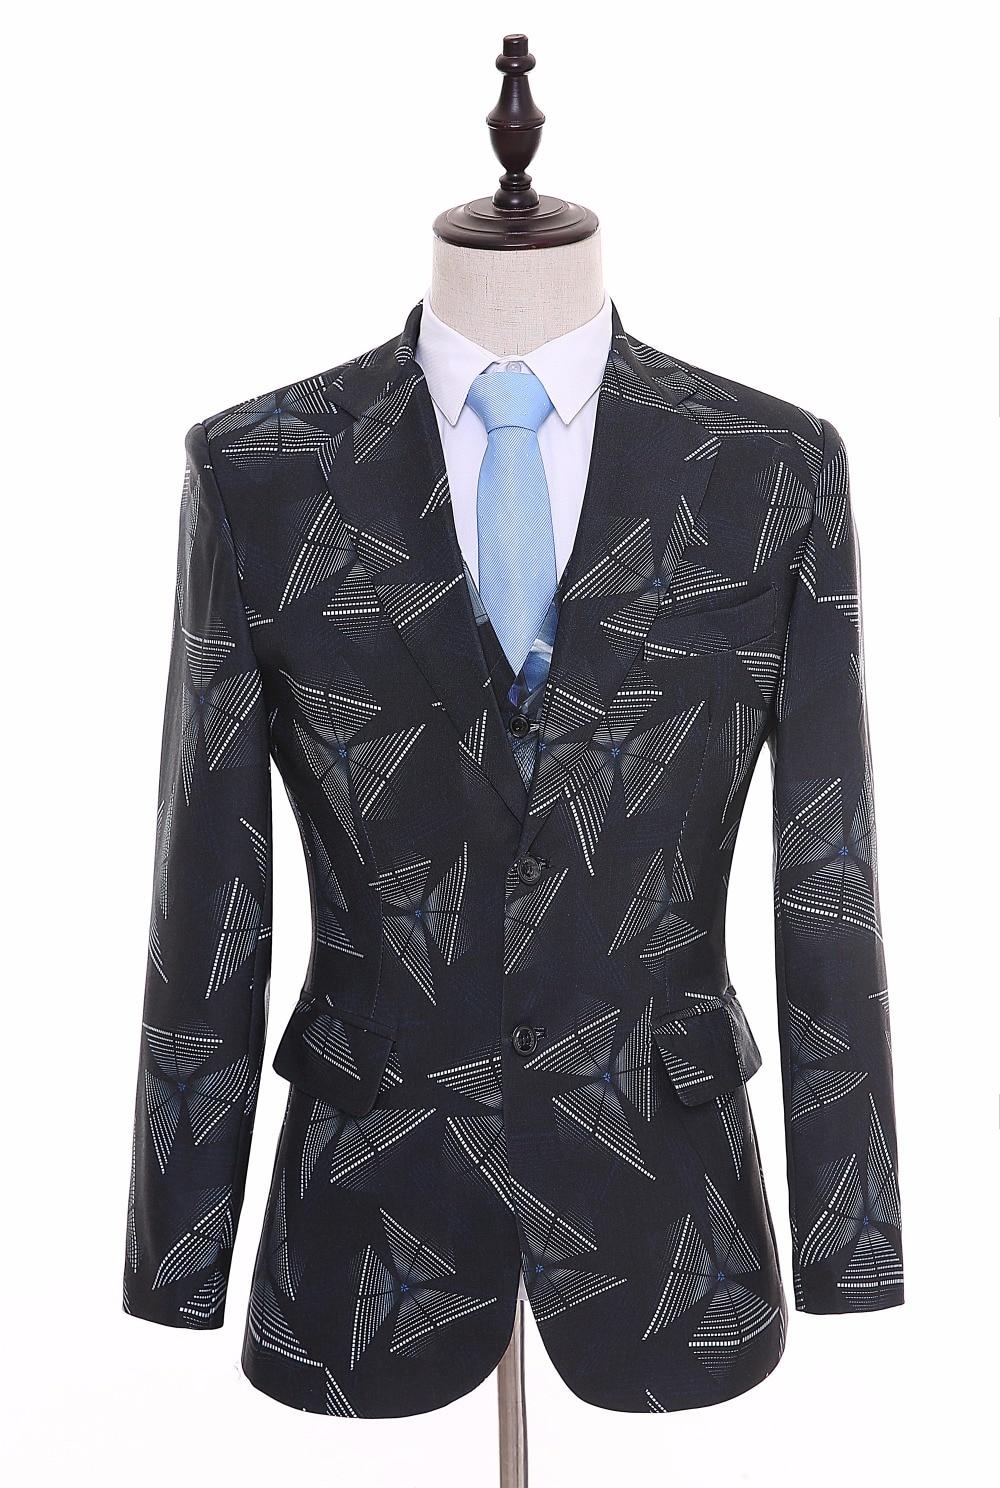 British Style Flower Men's Suits Slim Fit Bespoke Notched Lapel Two Buttons Groom Tuxedso Mens Wedding Suit Jackepant+vest